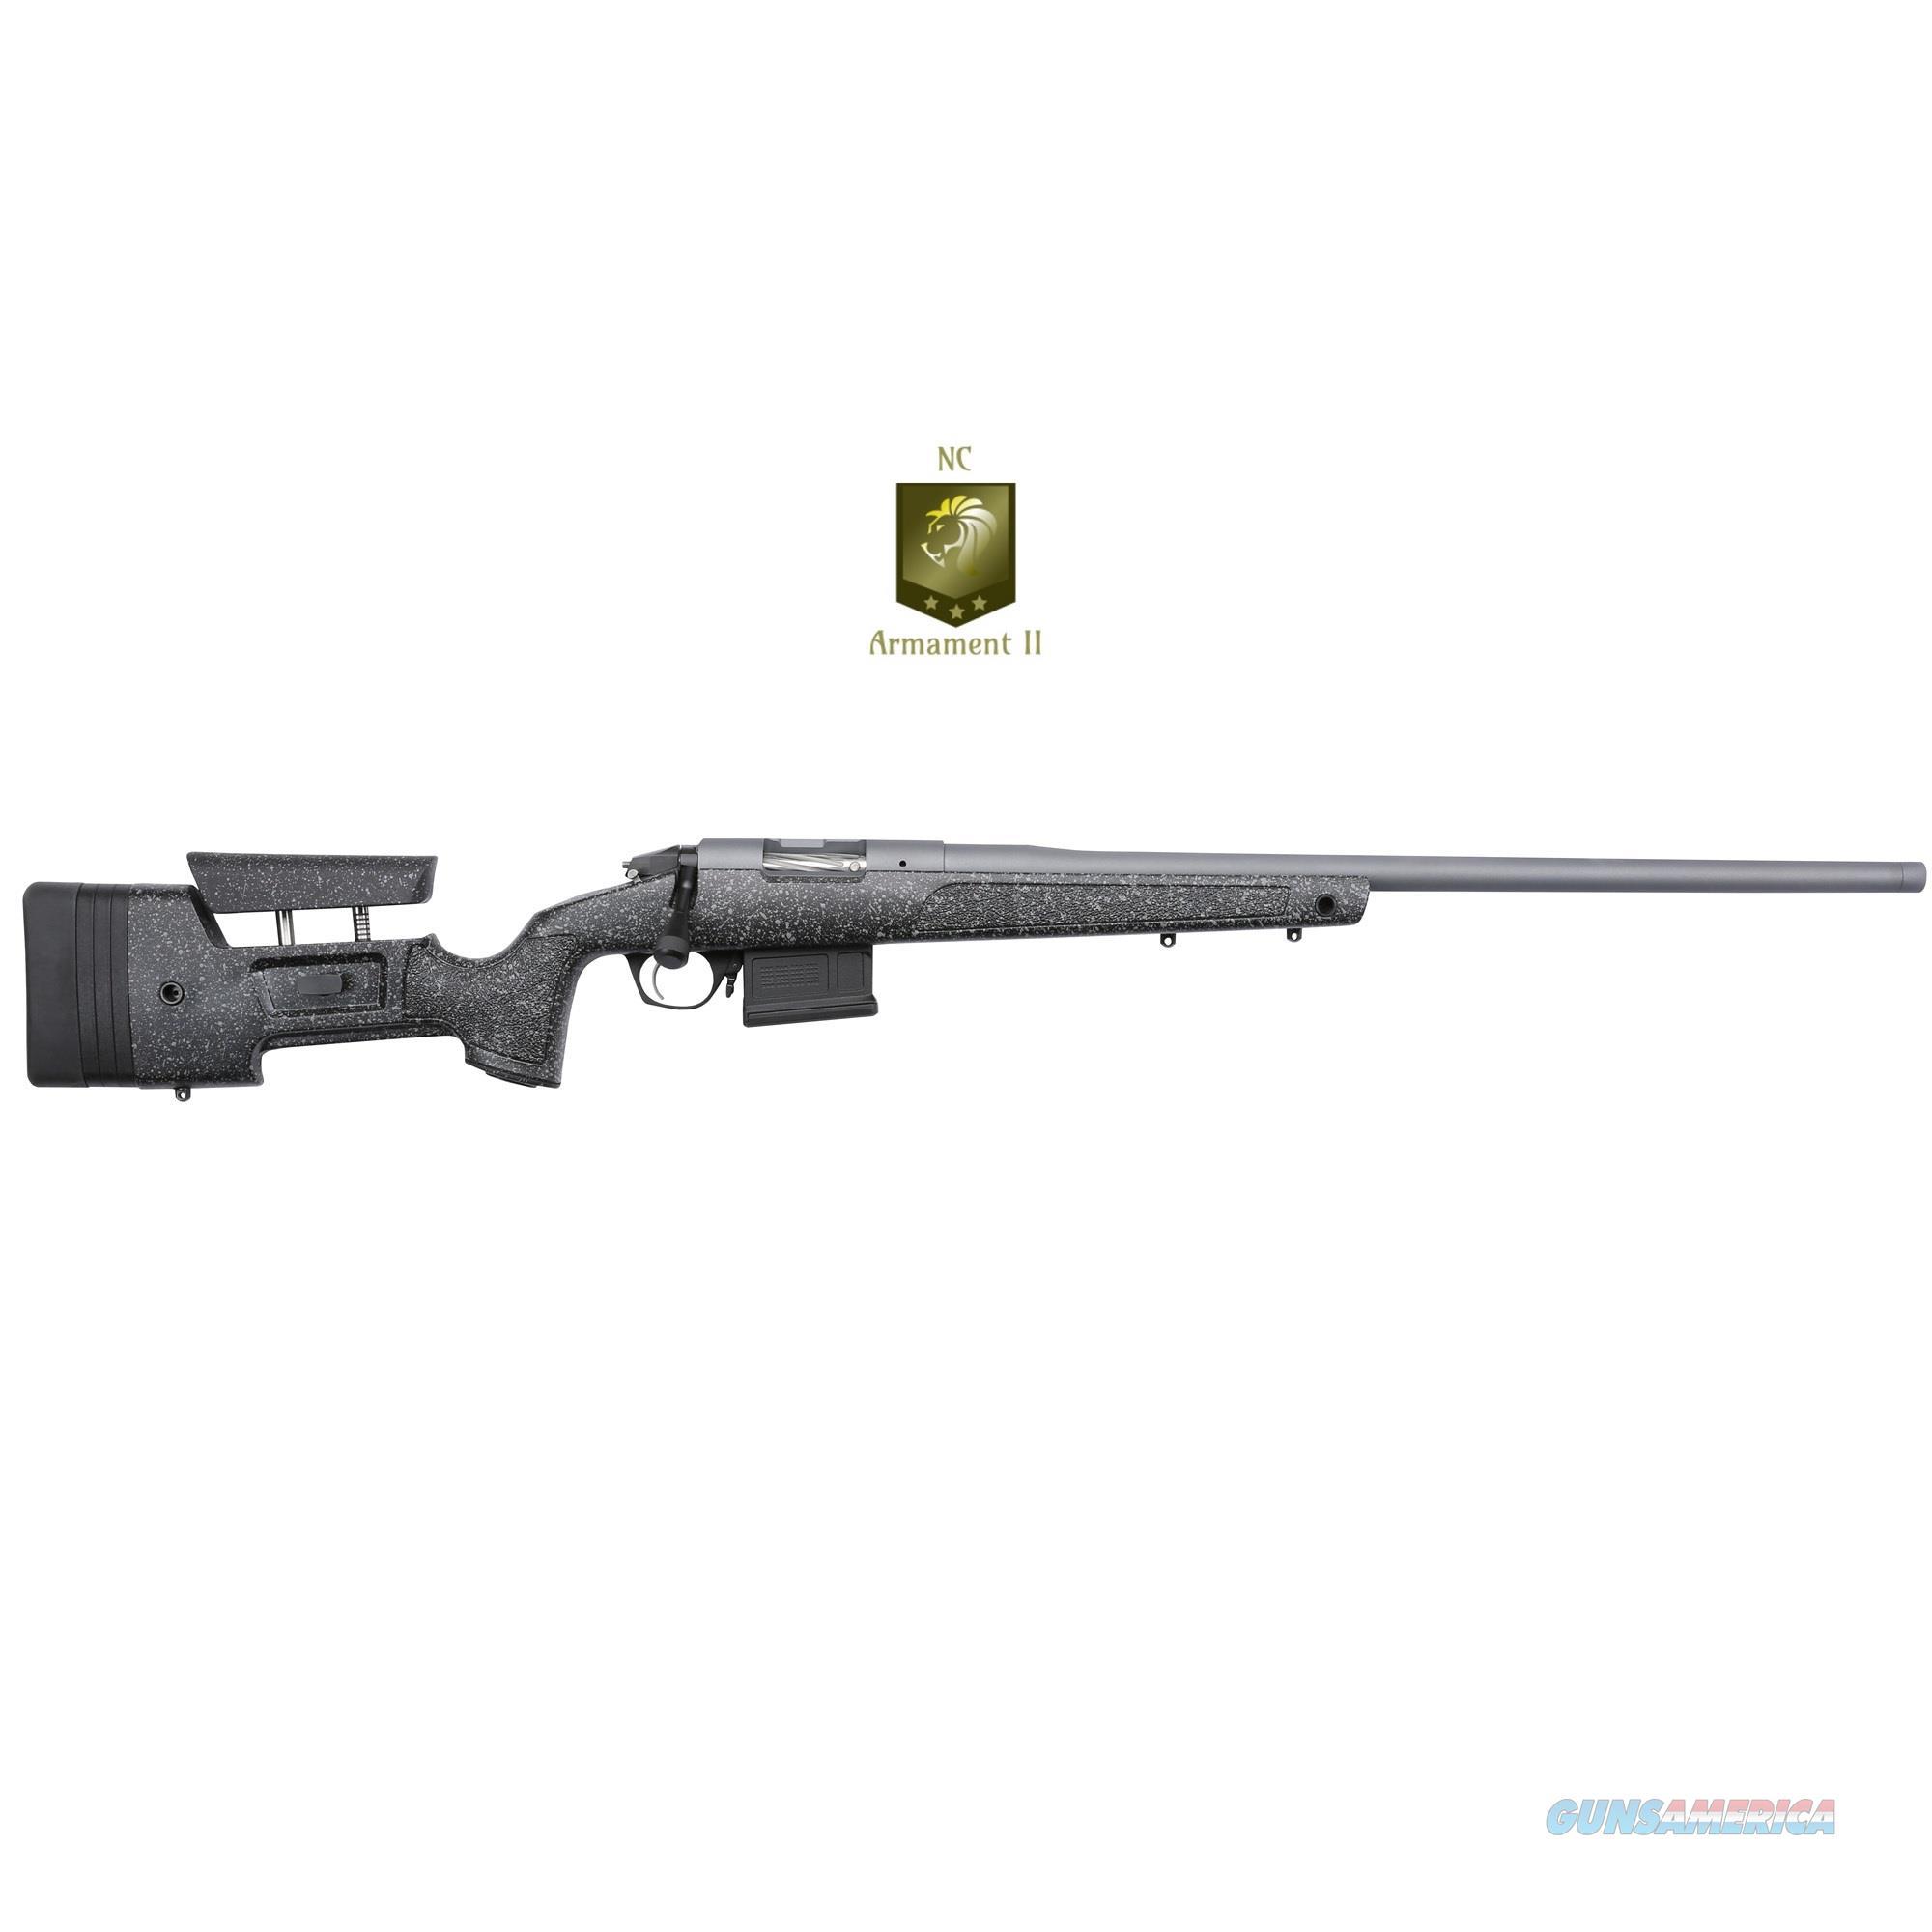 Bergara HMR PRO 6.5prc 26 Inch Threaded Barrel Gray Finish  Guns > Rifles > Bergara Rifles